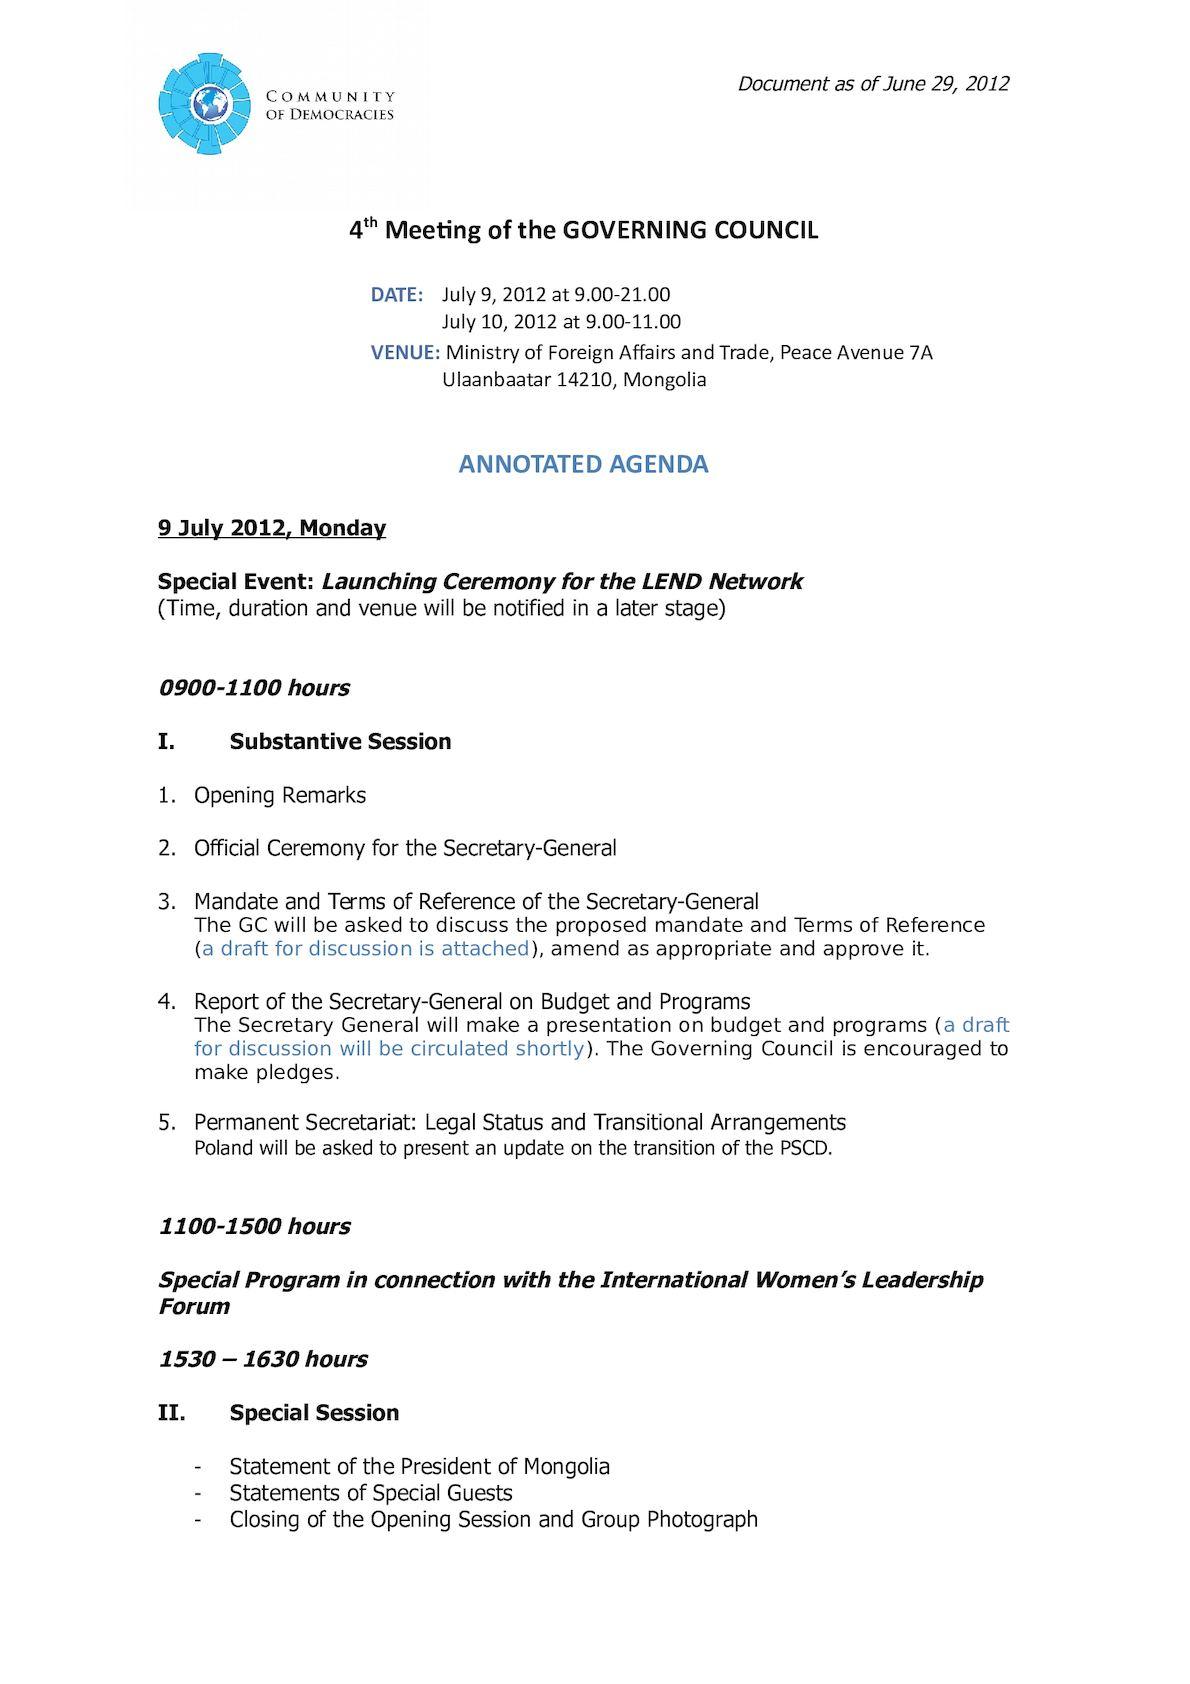 4th GC Meeting ANNOTATED AGENDA (June 29, 2012).